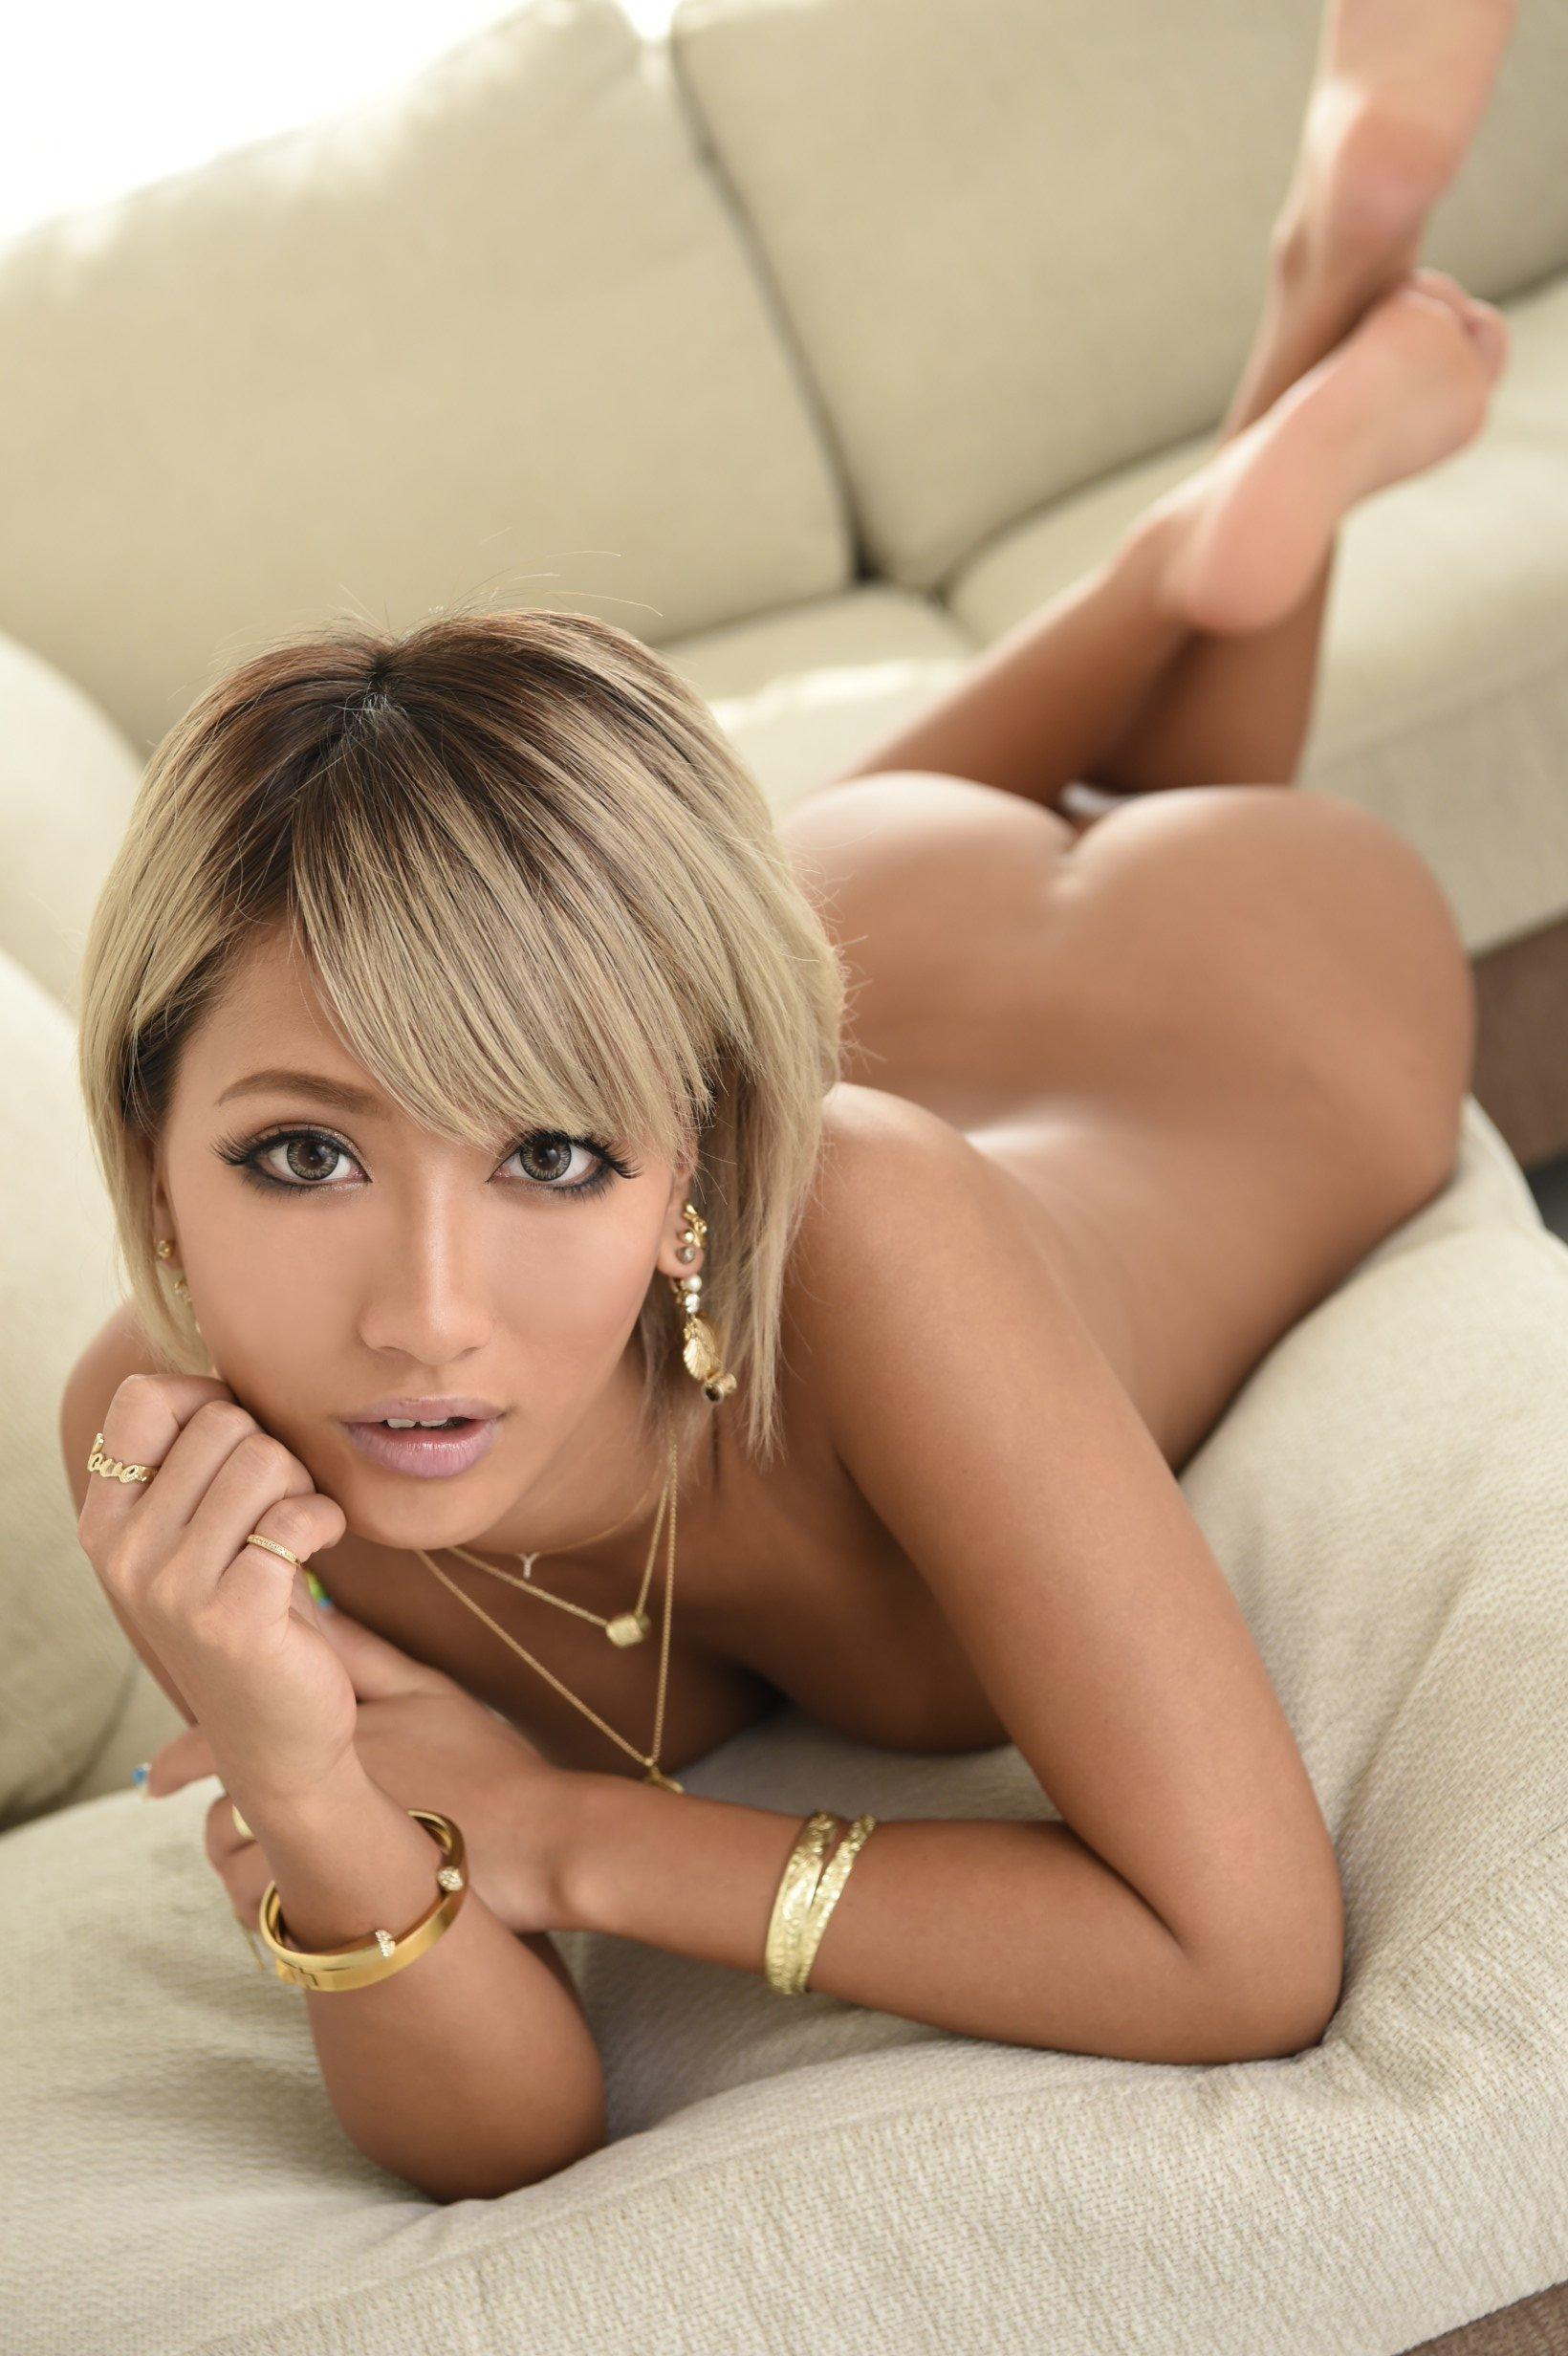 Aika Porn Actress showing xxx images for jap pornstar aika uncensored xxx